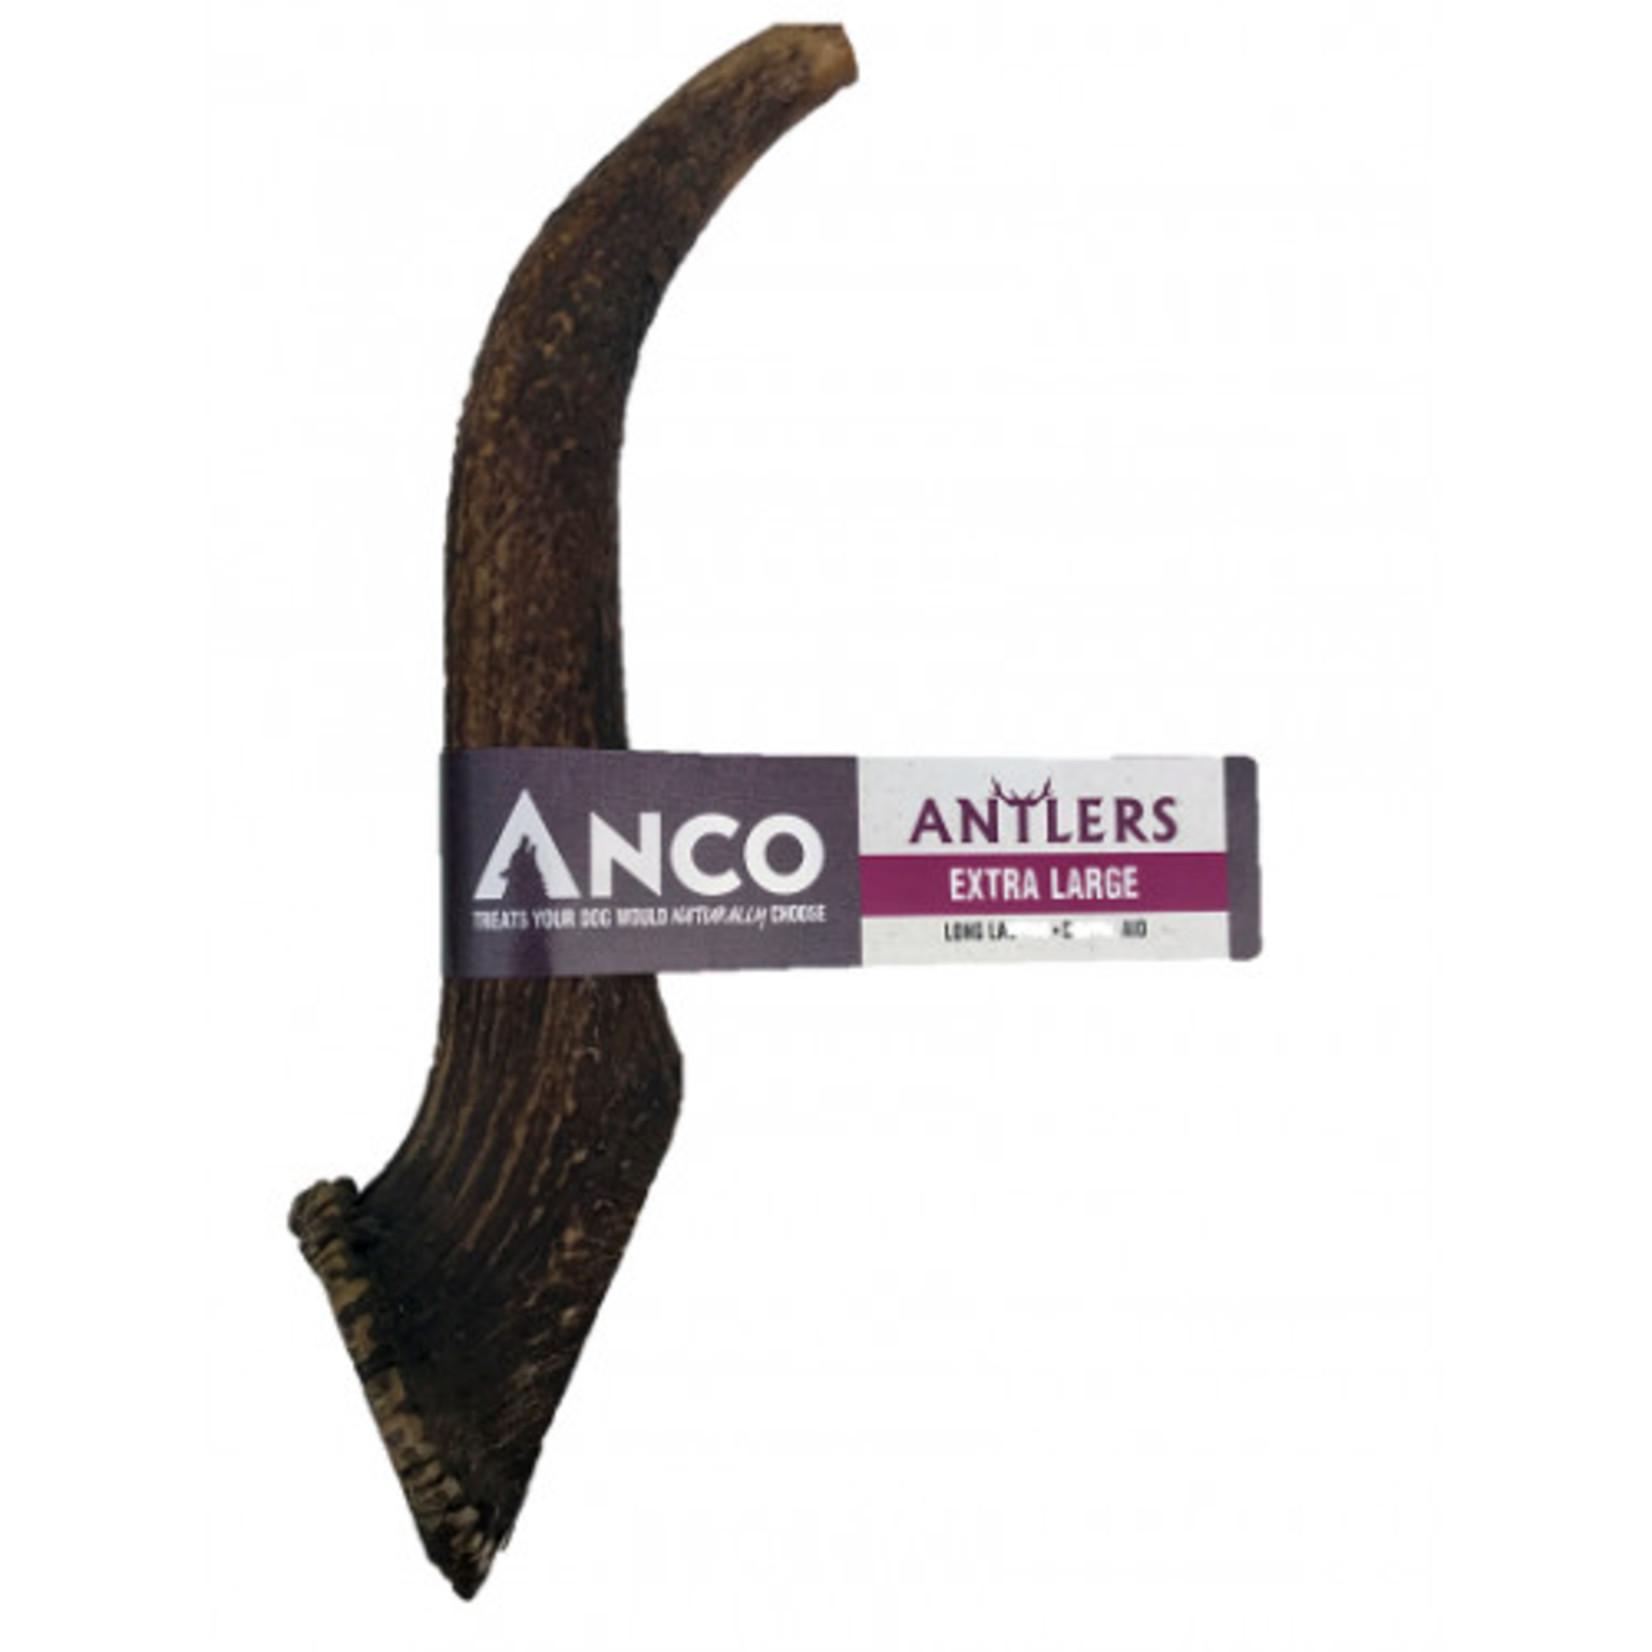 Anco Antler Bar Dog Chew Treat